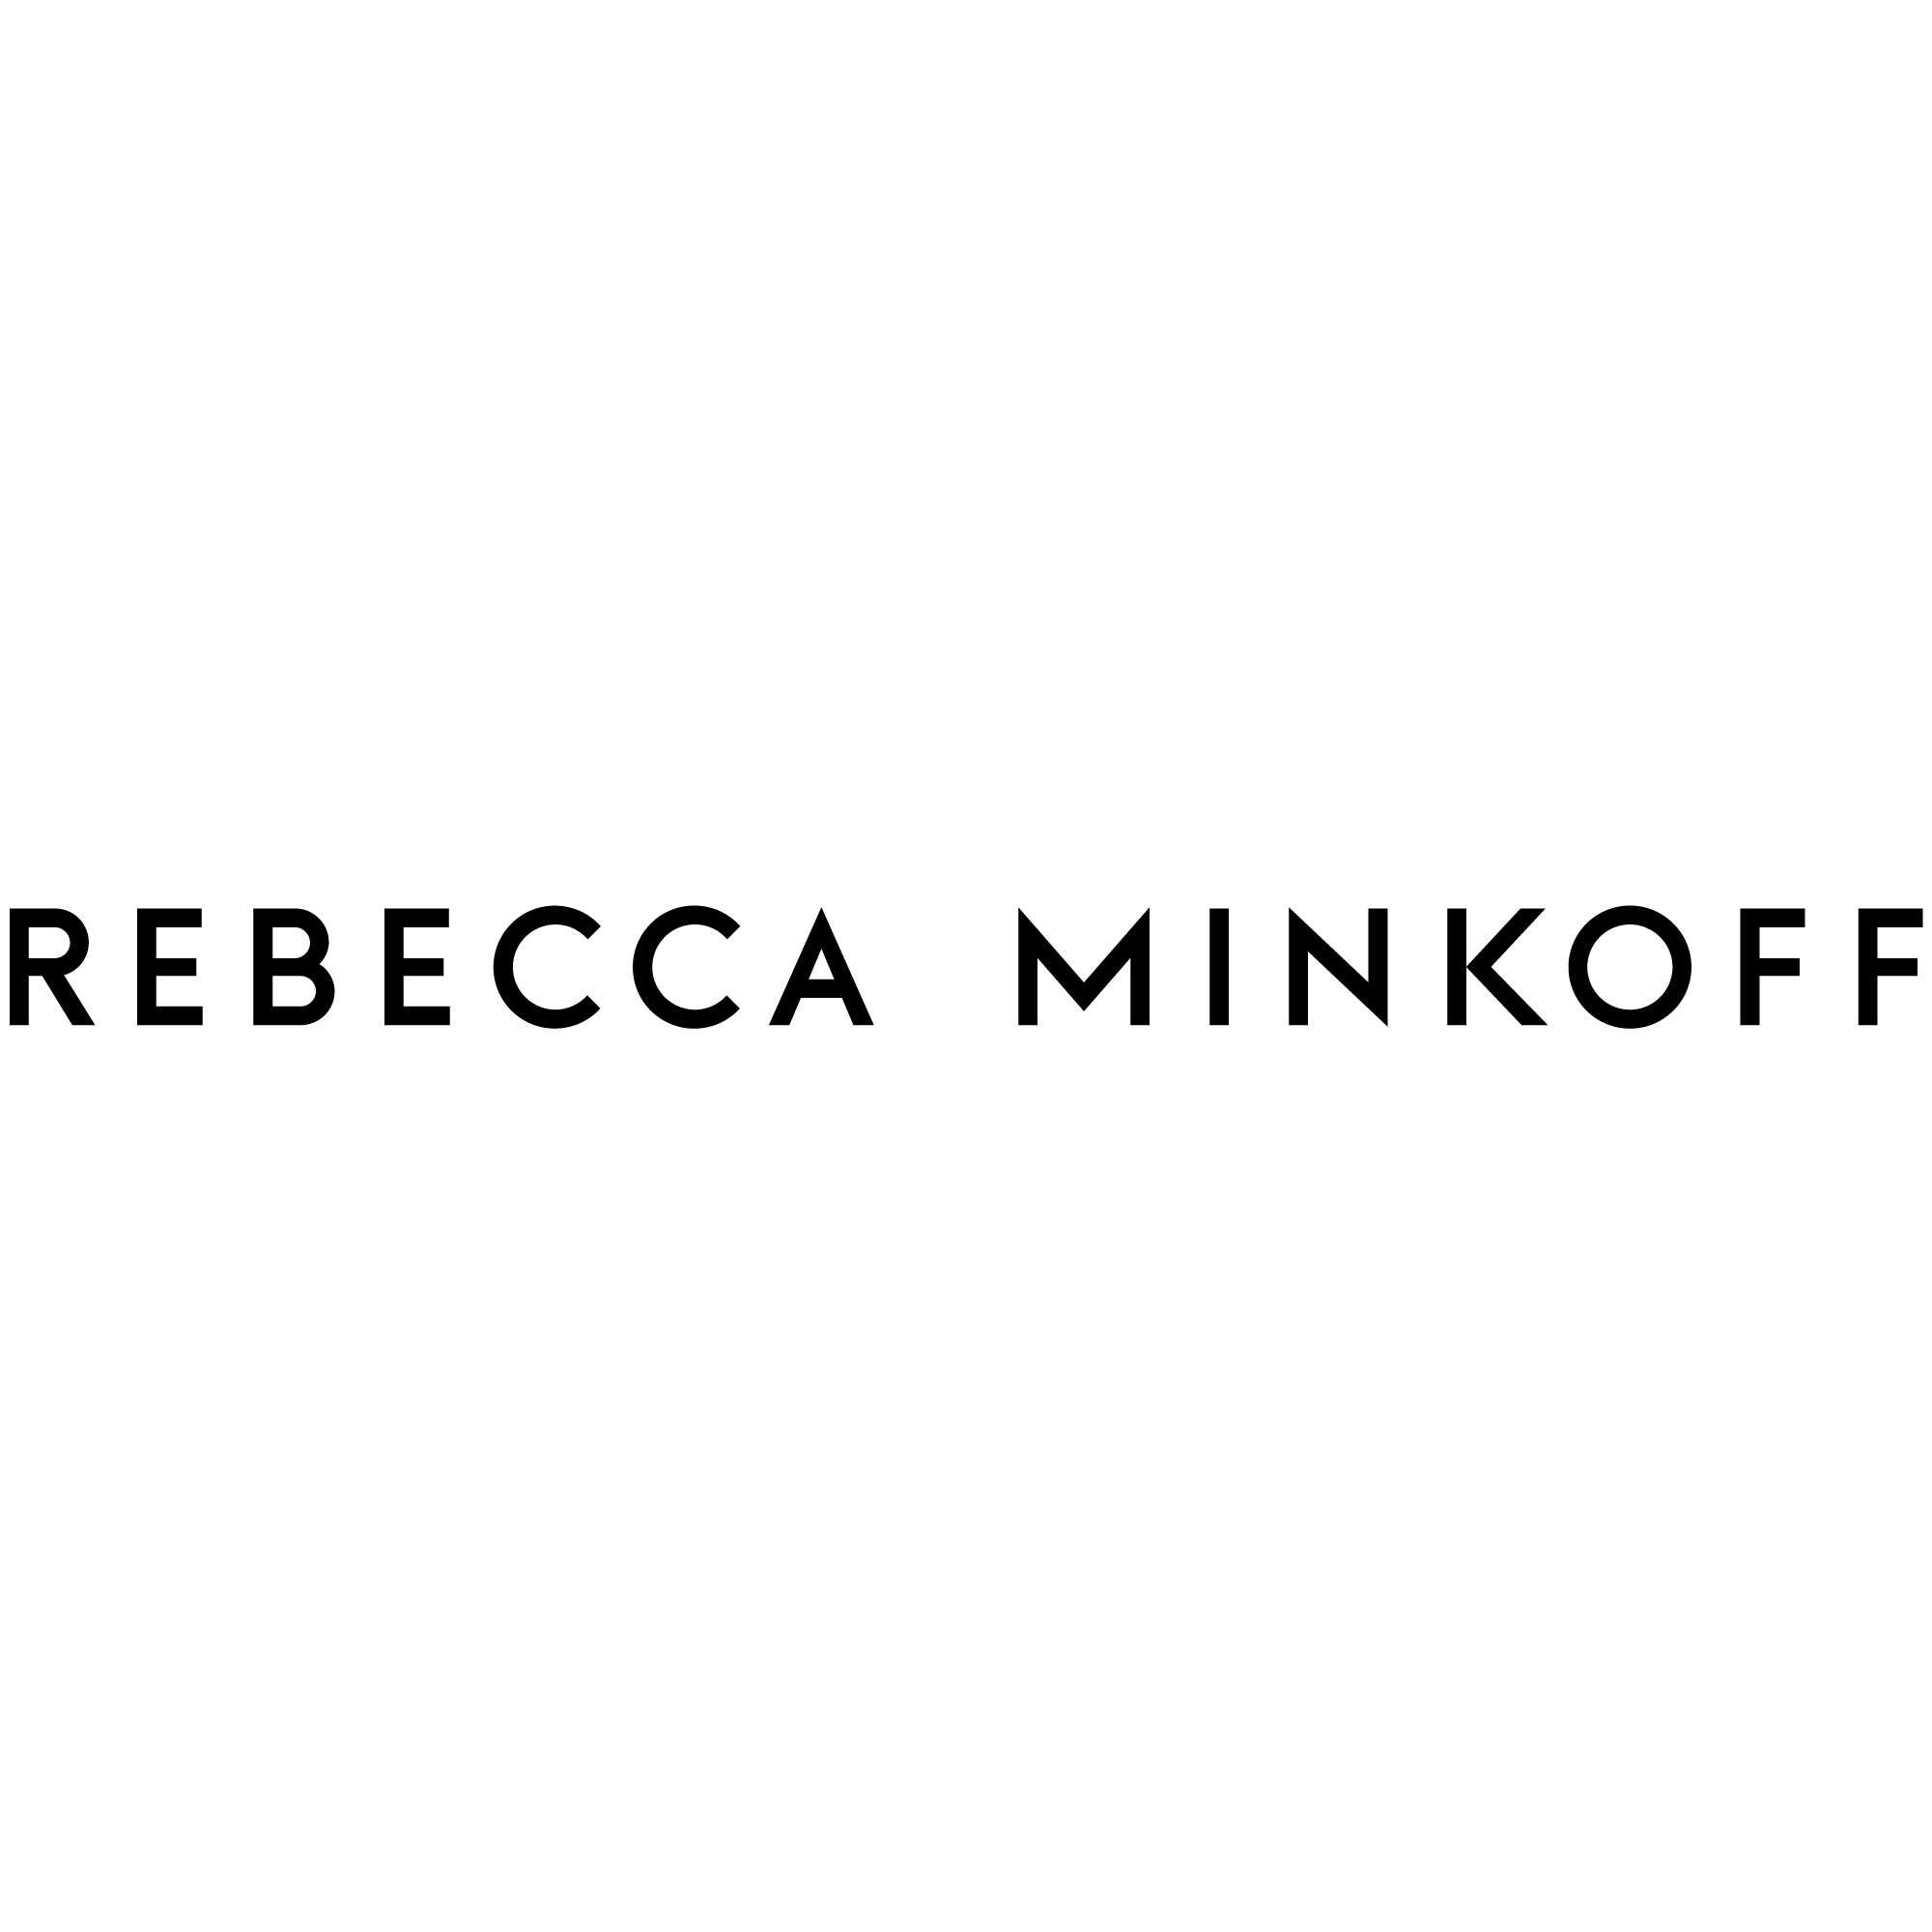 Rebecca Minkoff Logo Black Transparent